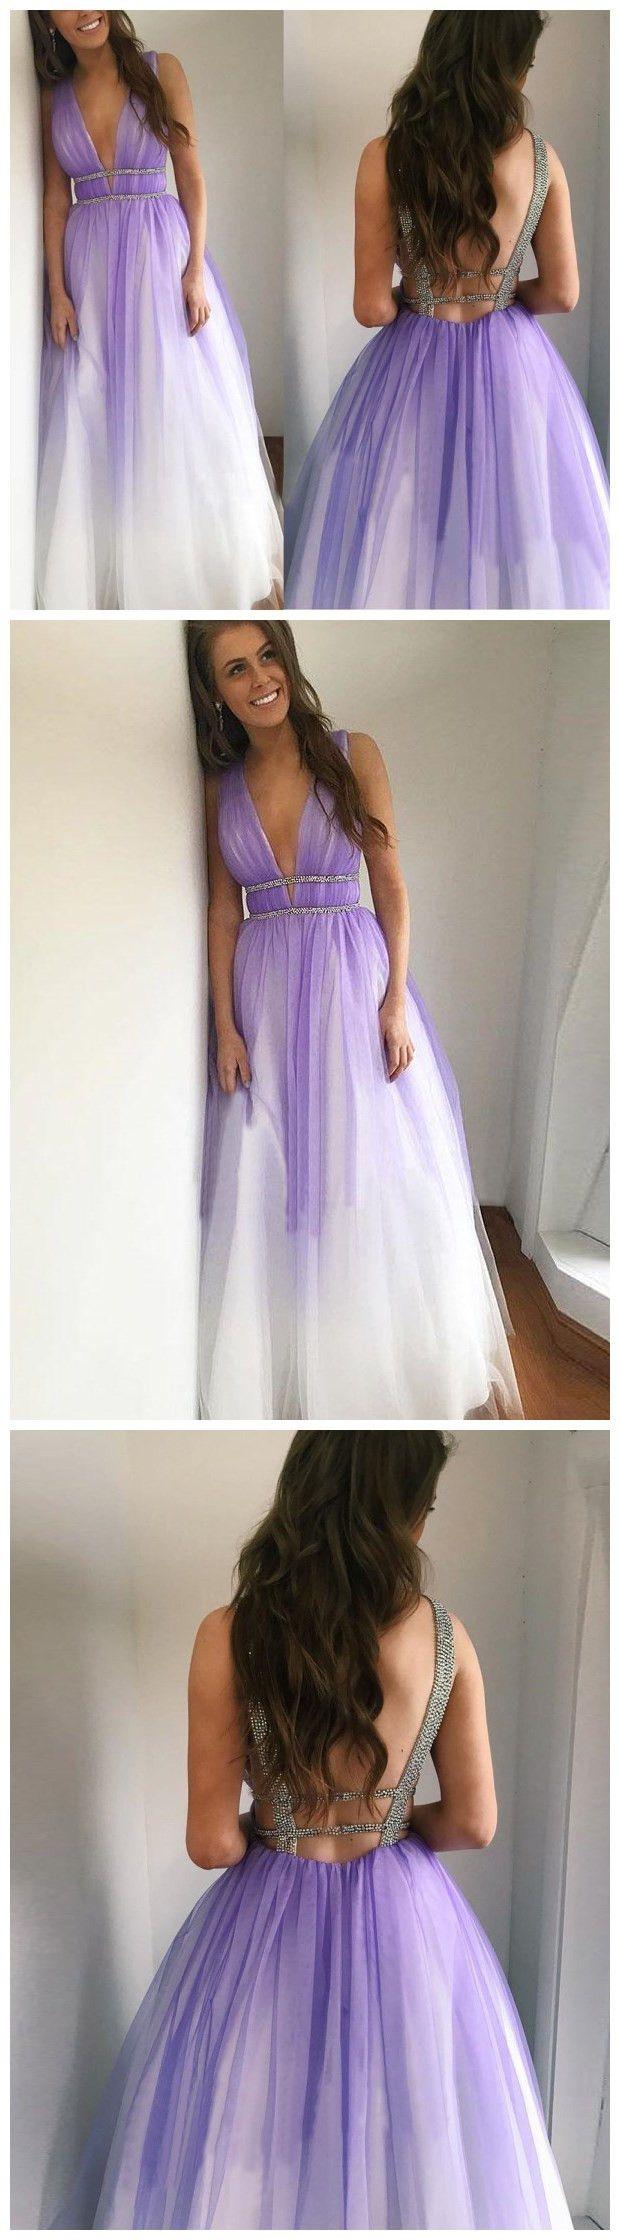 prom dress aline straps ombre sleeveless elegant long prom